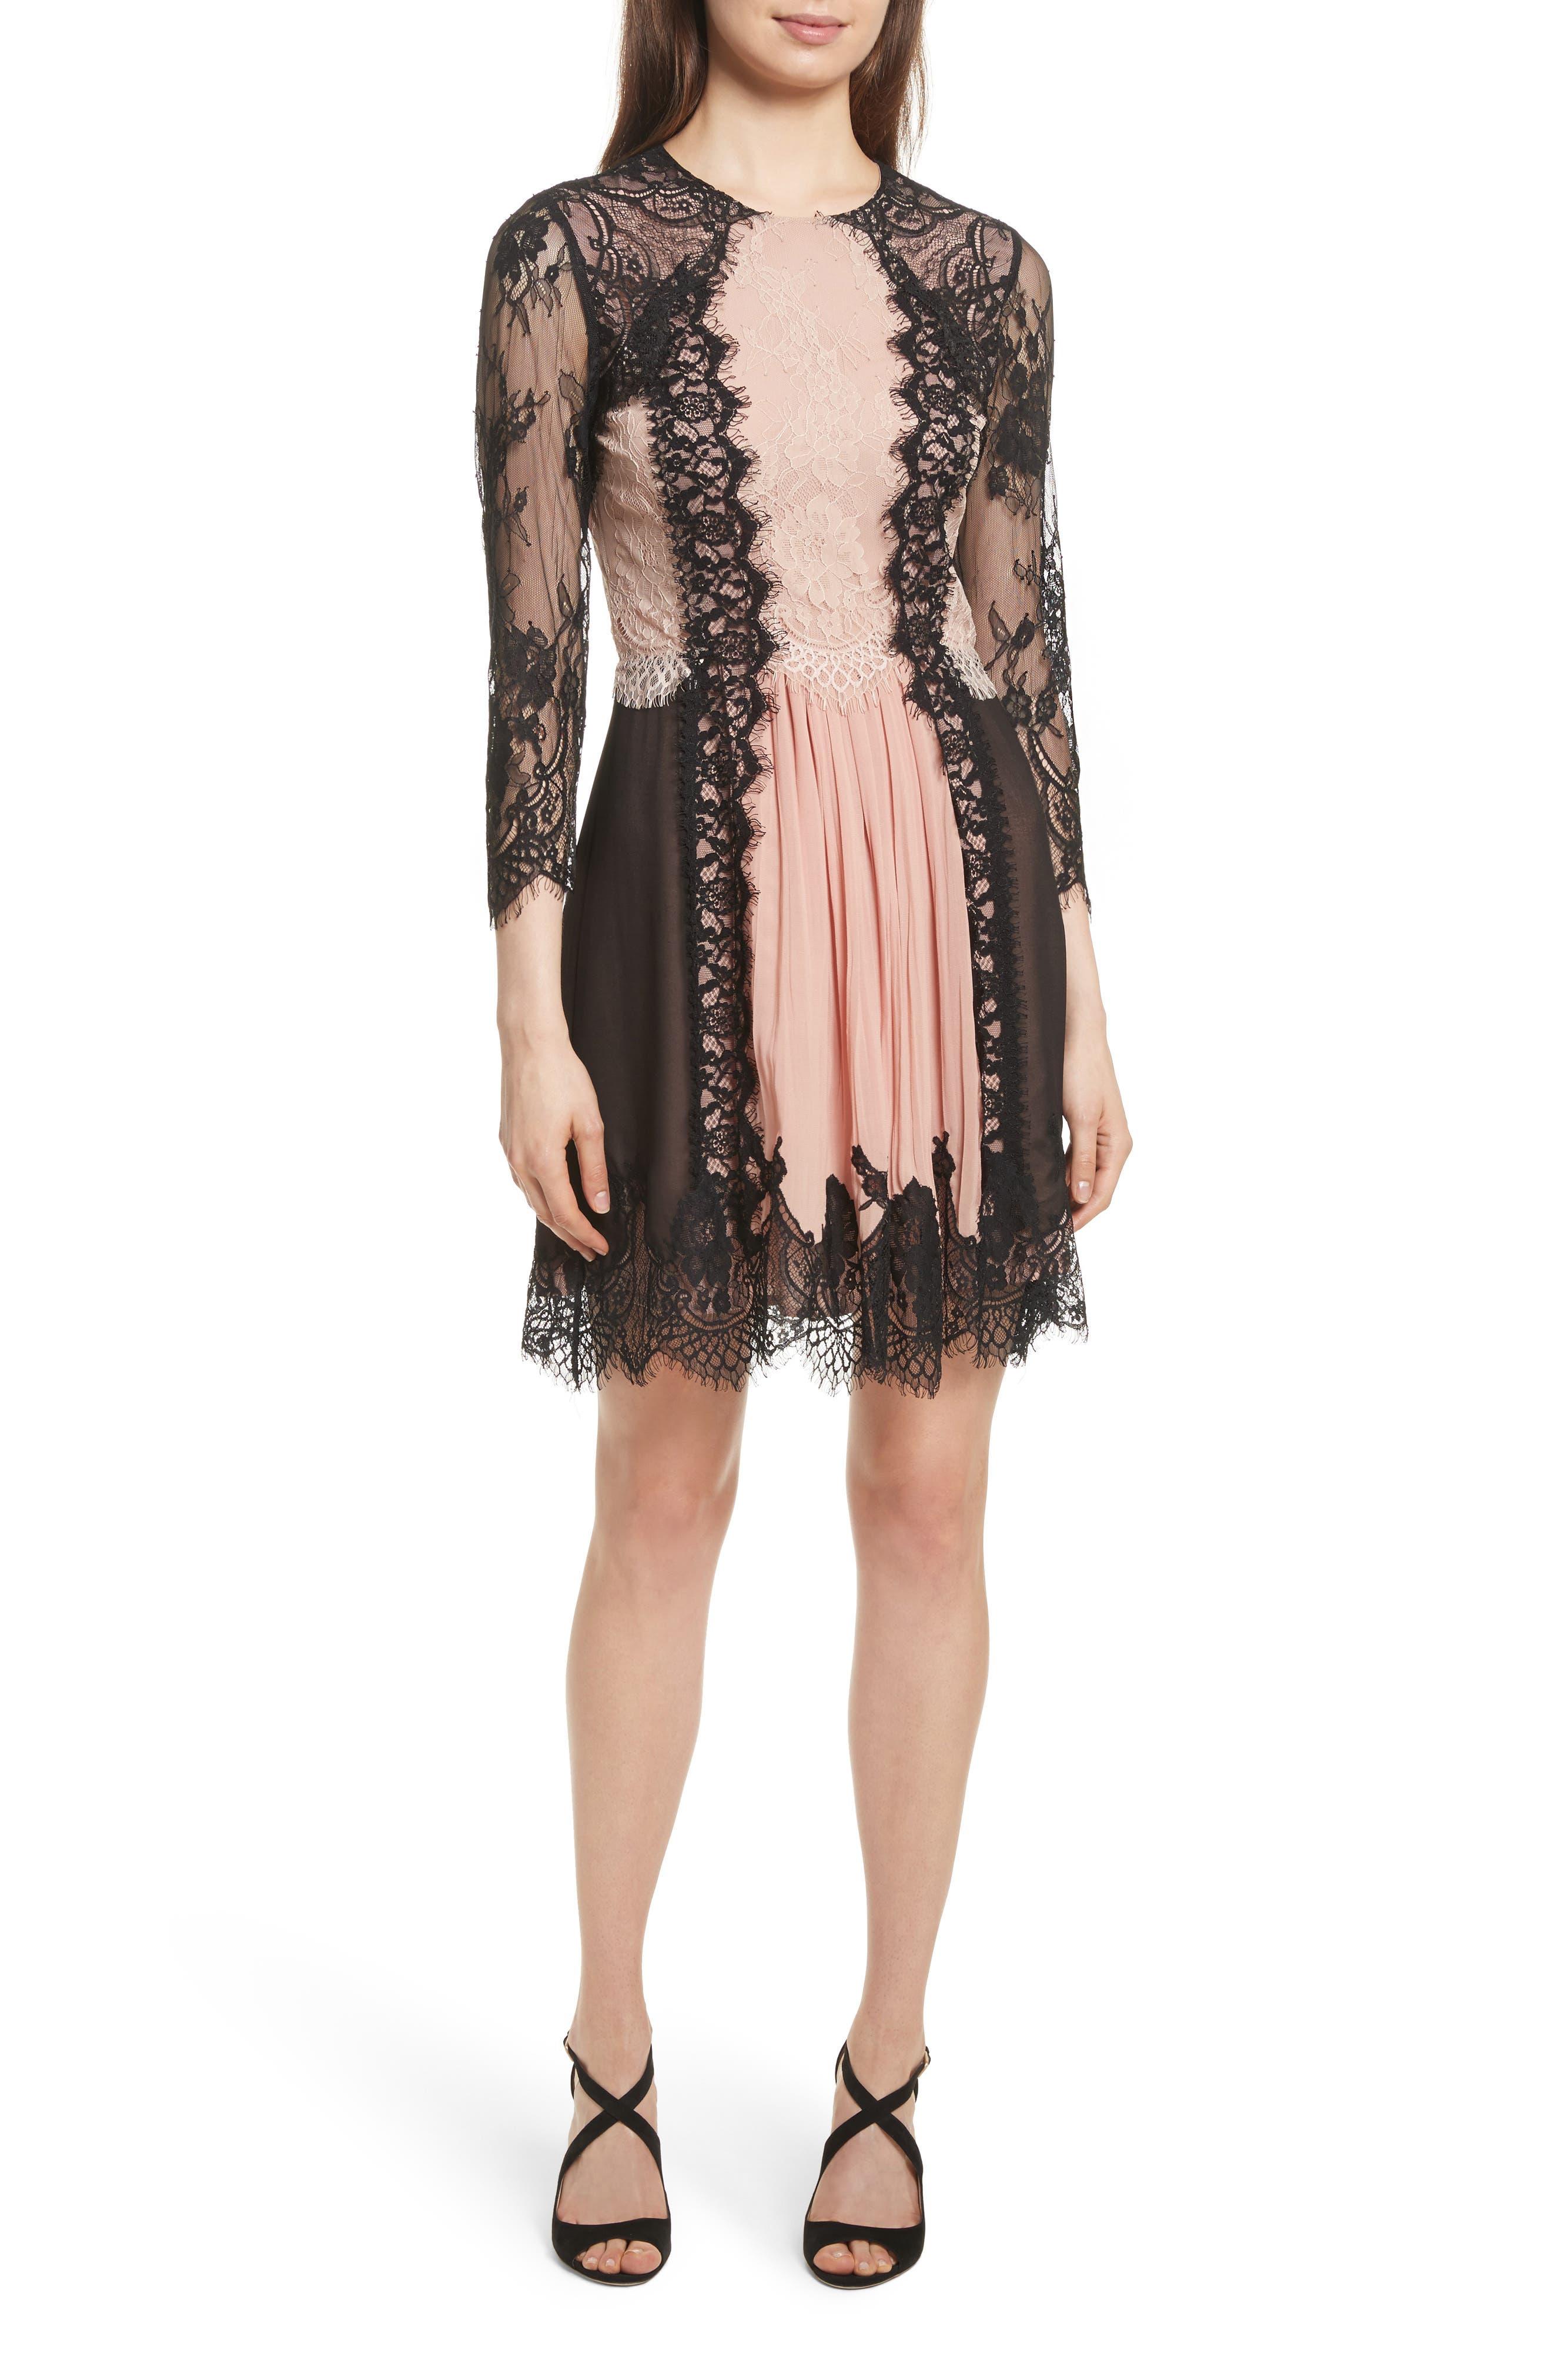 Alice + Olivia Kaylen Mixed Lace Dress